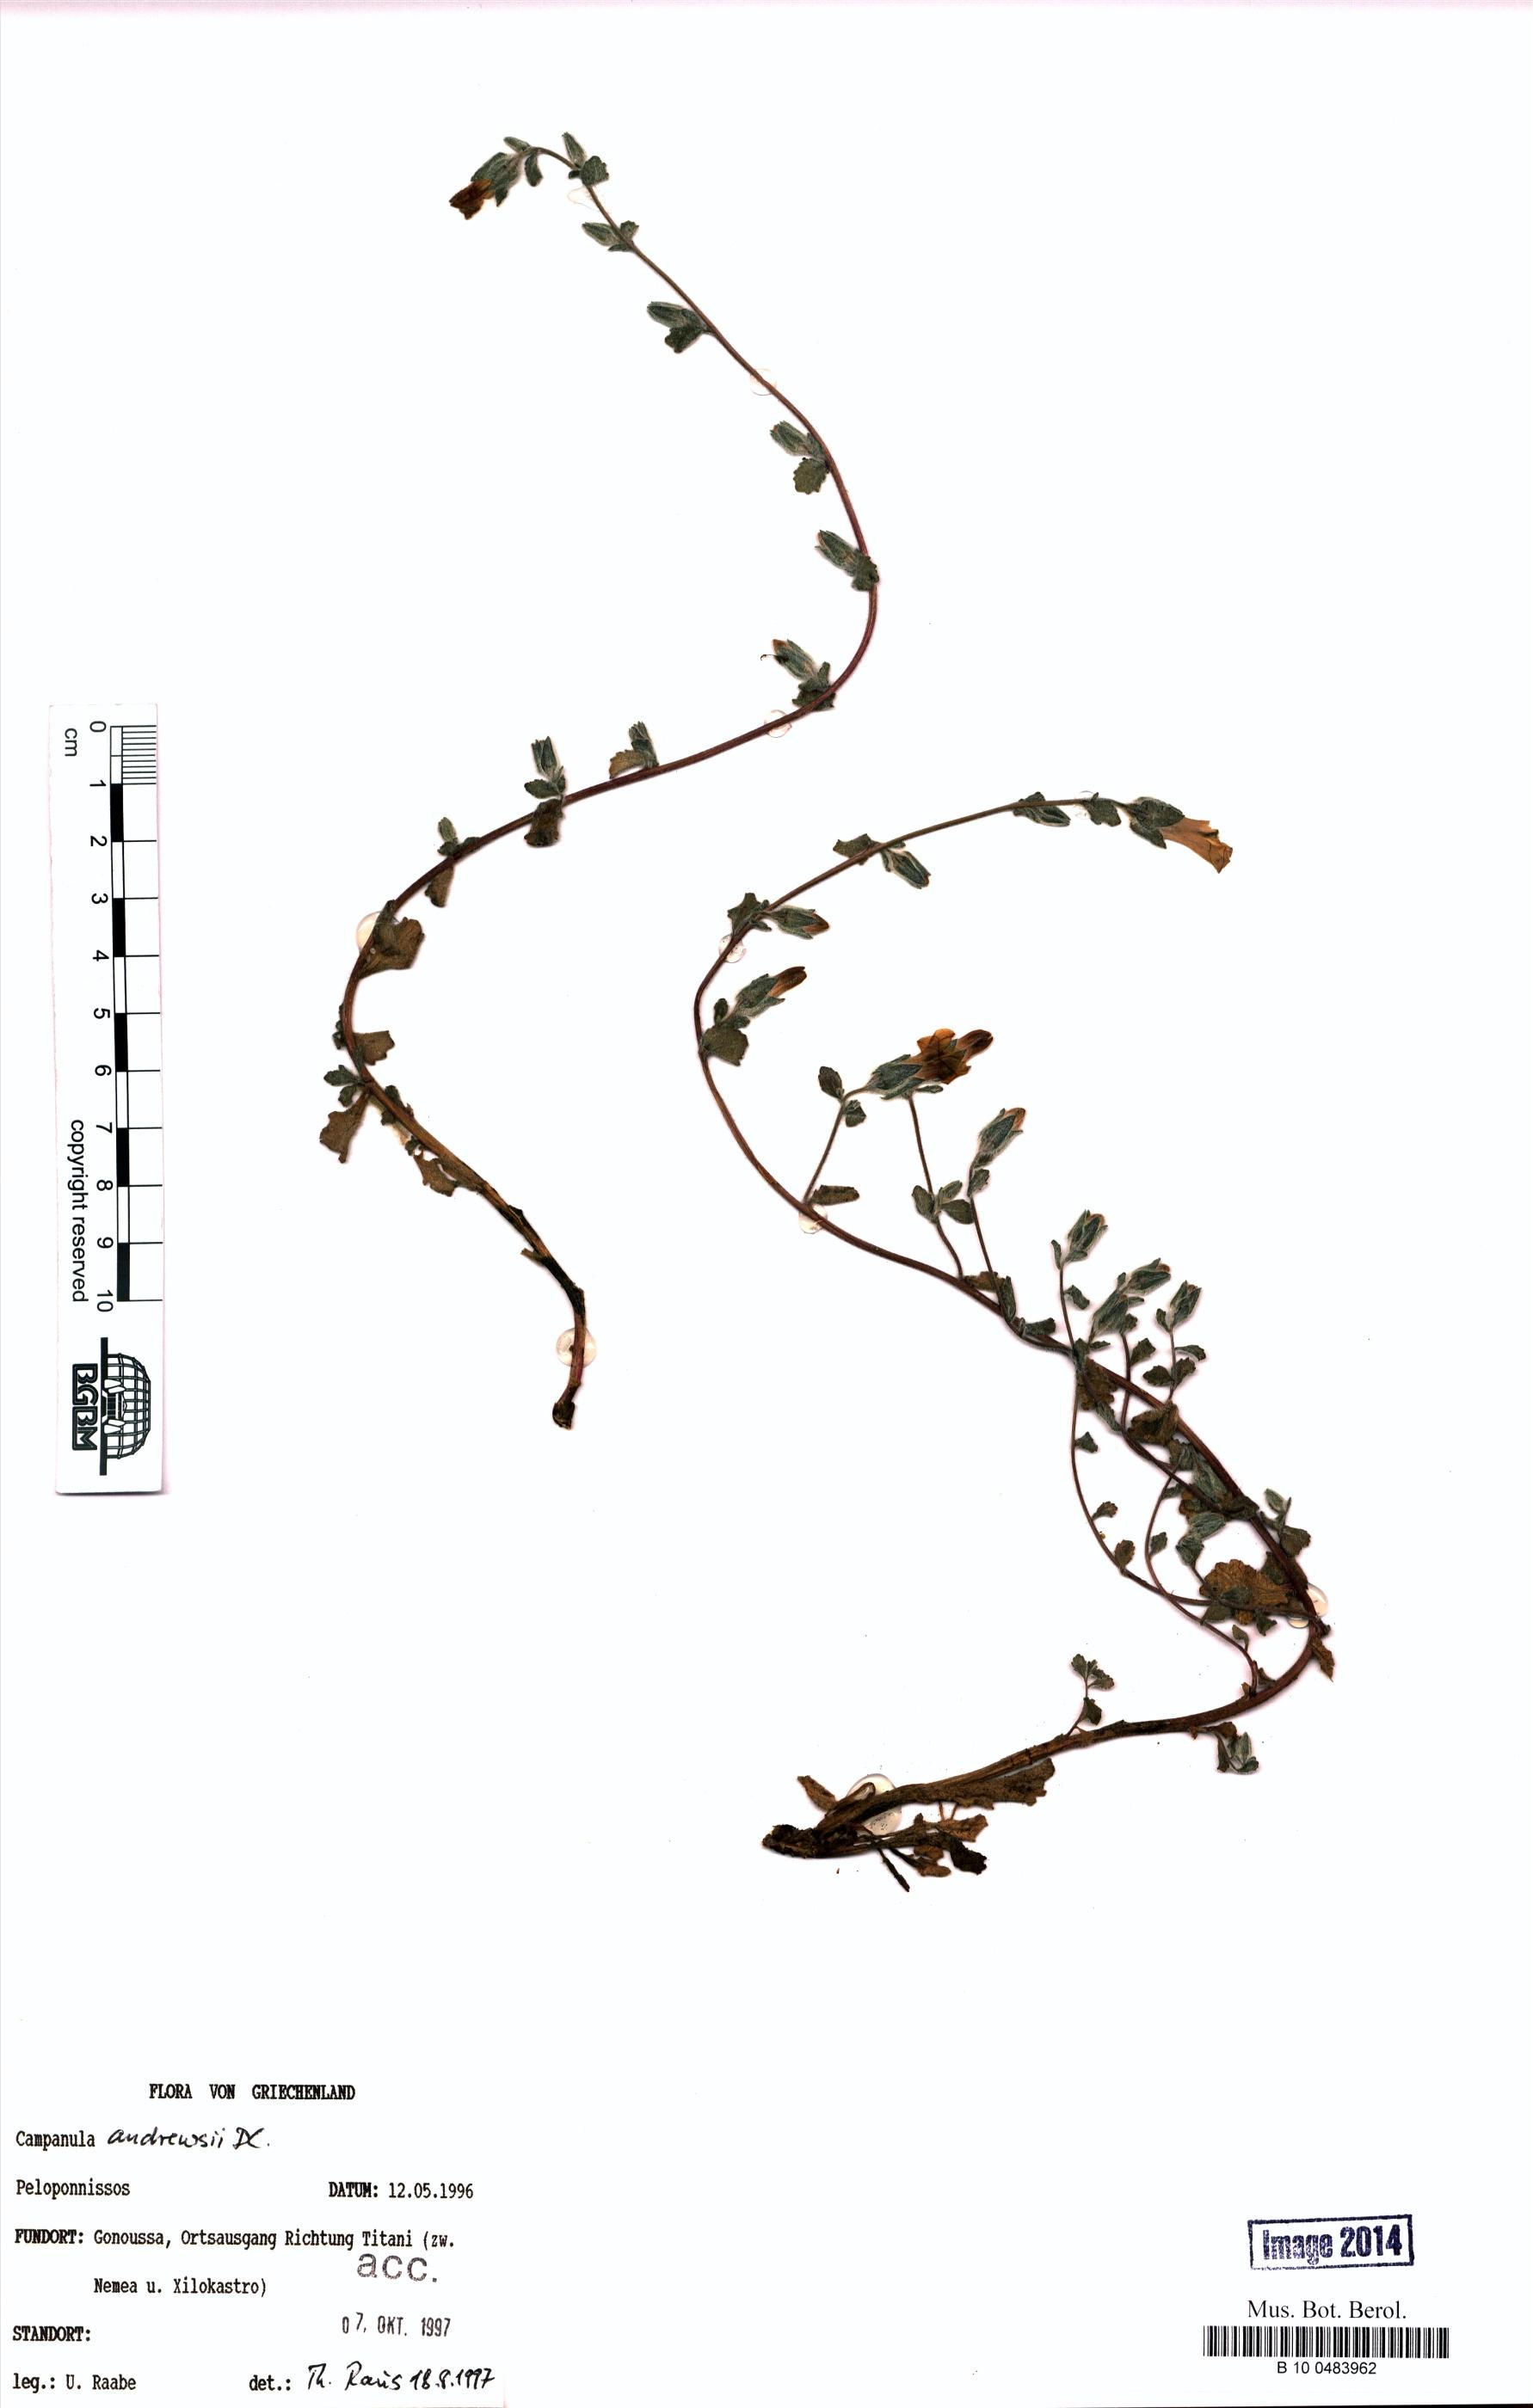 http://ww2.bgbm.org/herbarium/images/B/10/04/83/96/B_10_0483962.jpg